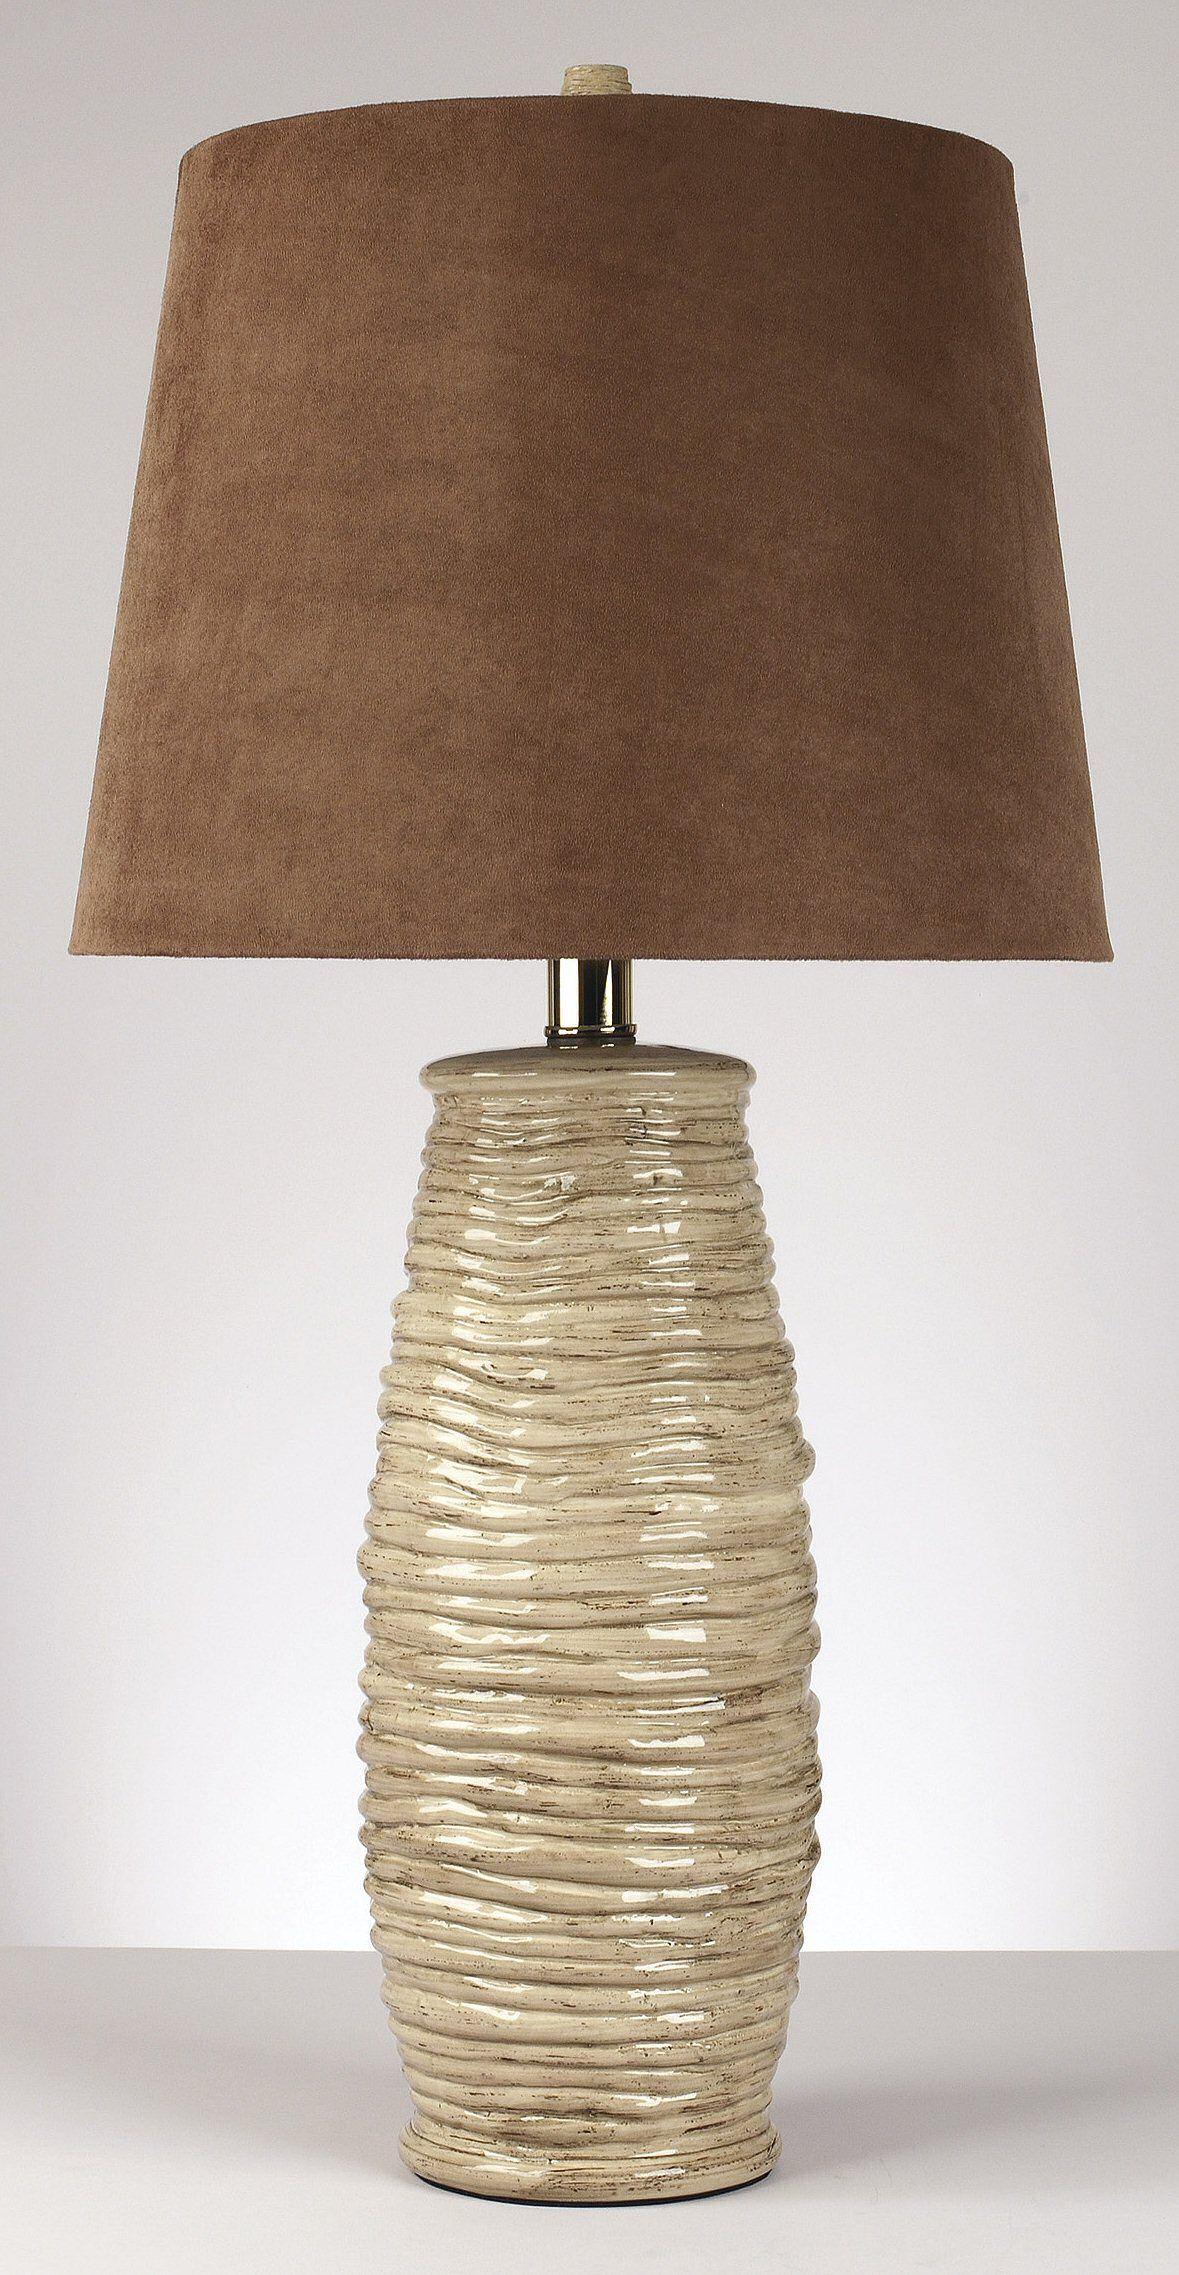 30 inchh haldis set of 2 table lamps textured beige ceramic signature design by ashley haldis set of 2 table lamps textured beige ceramic l136534 aloadofball Images